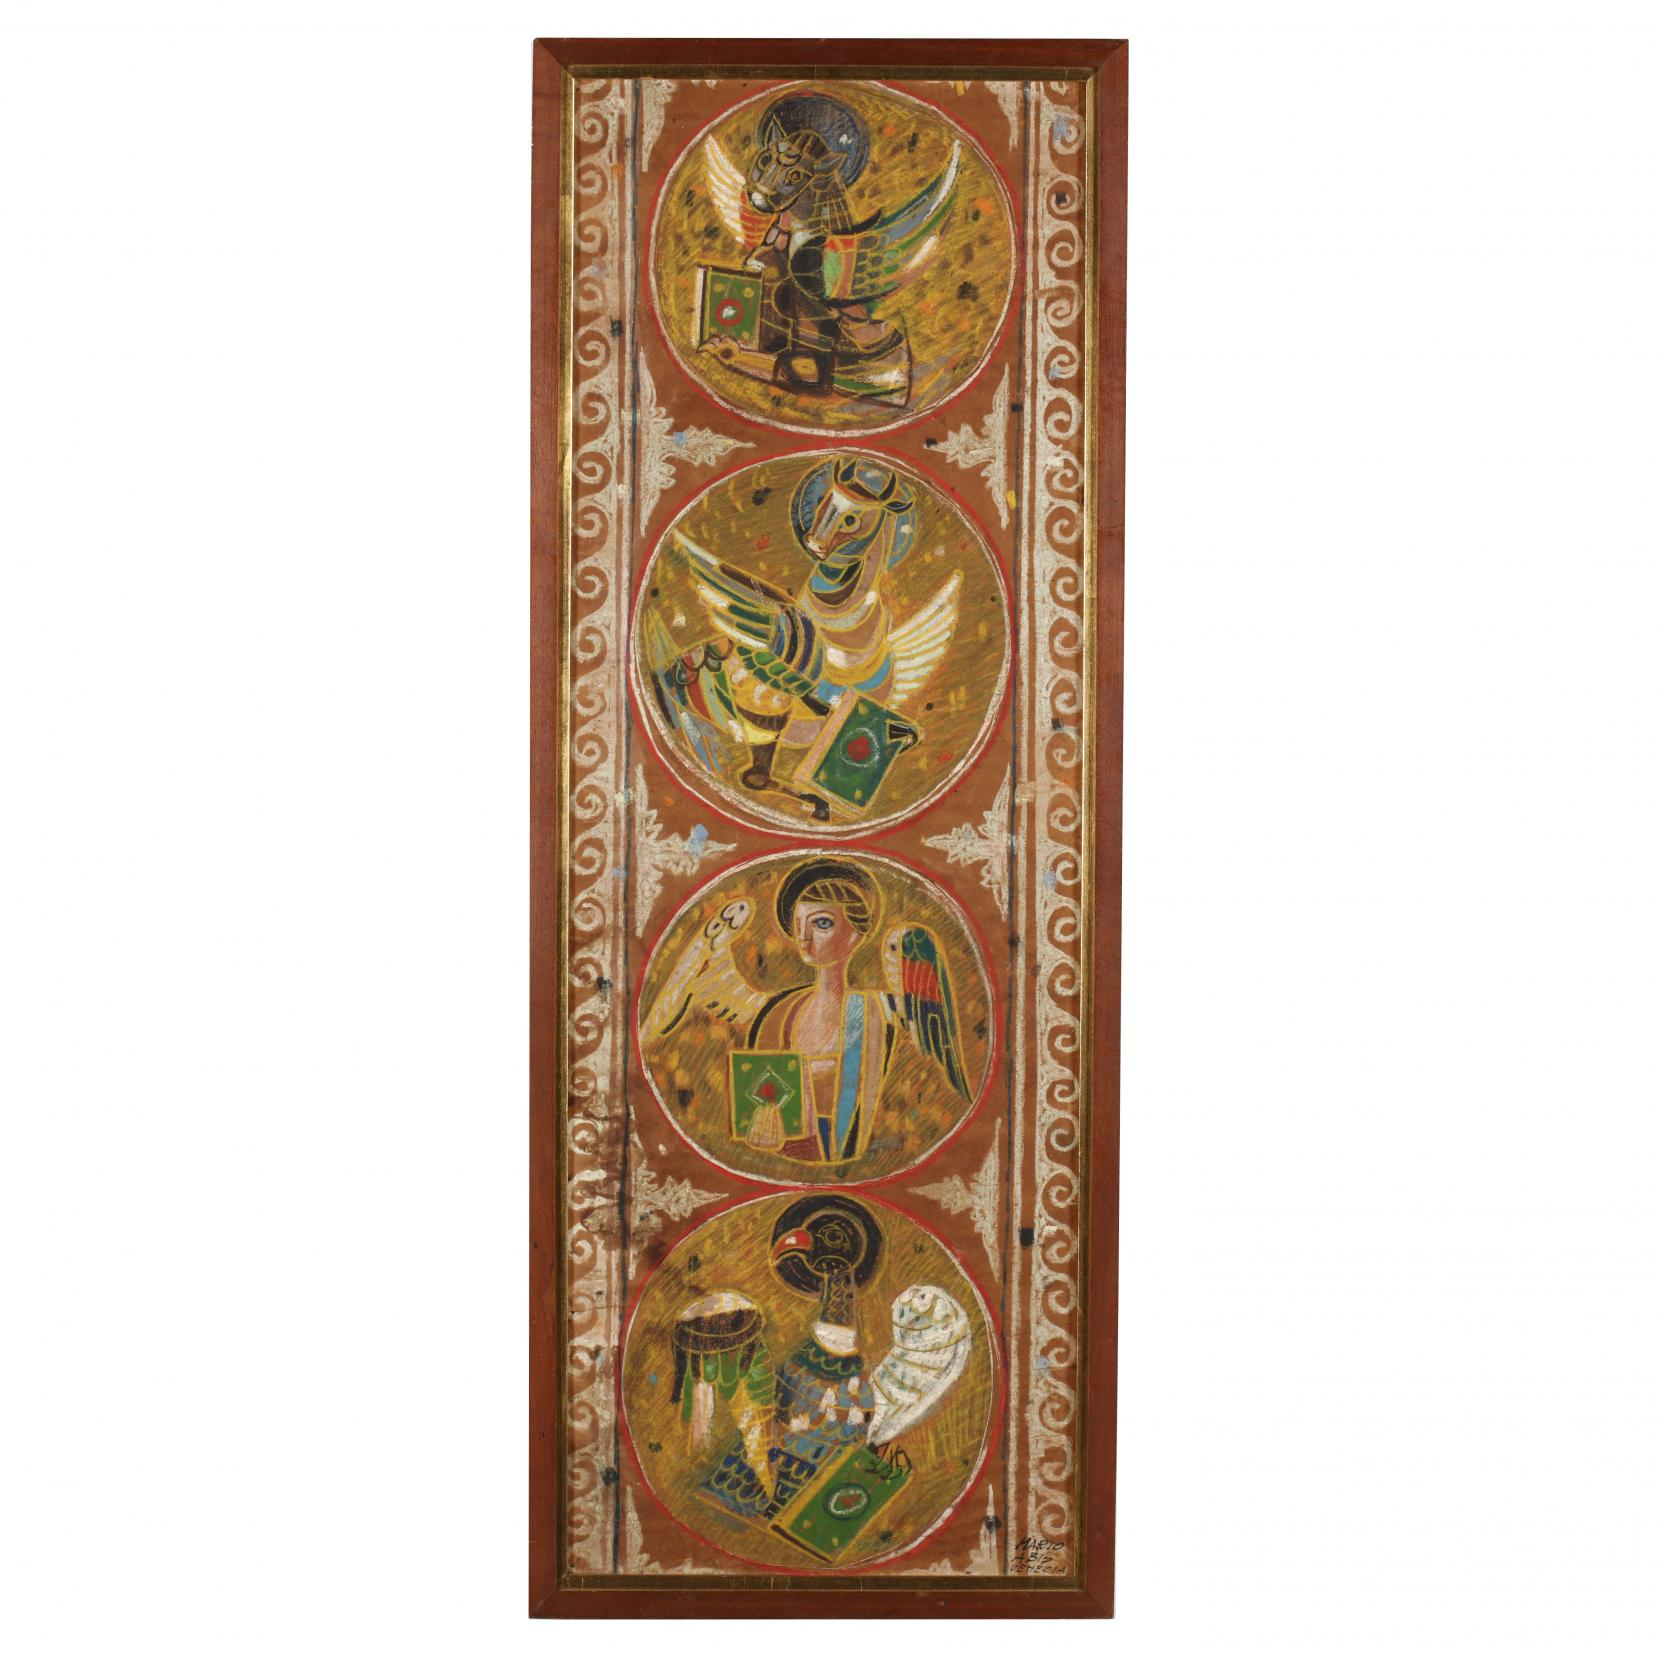 mario-abis-italian-b-1924-mosaico